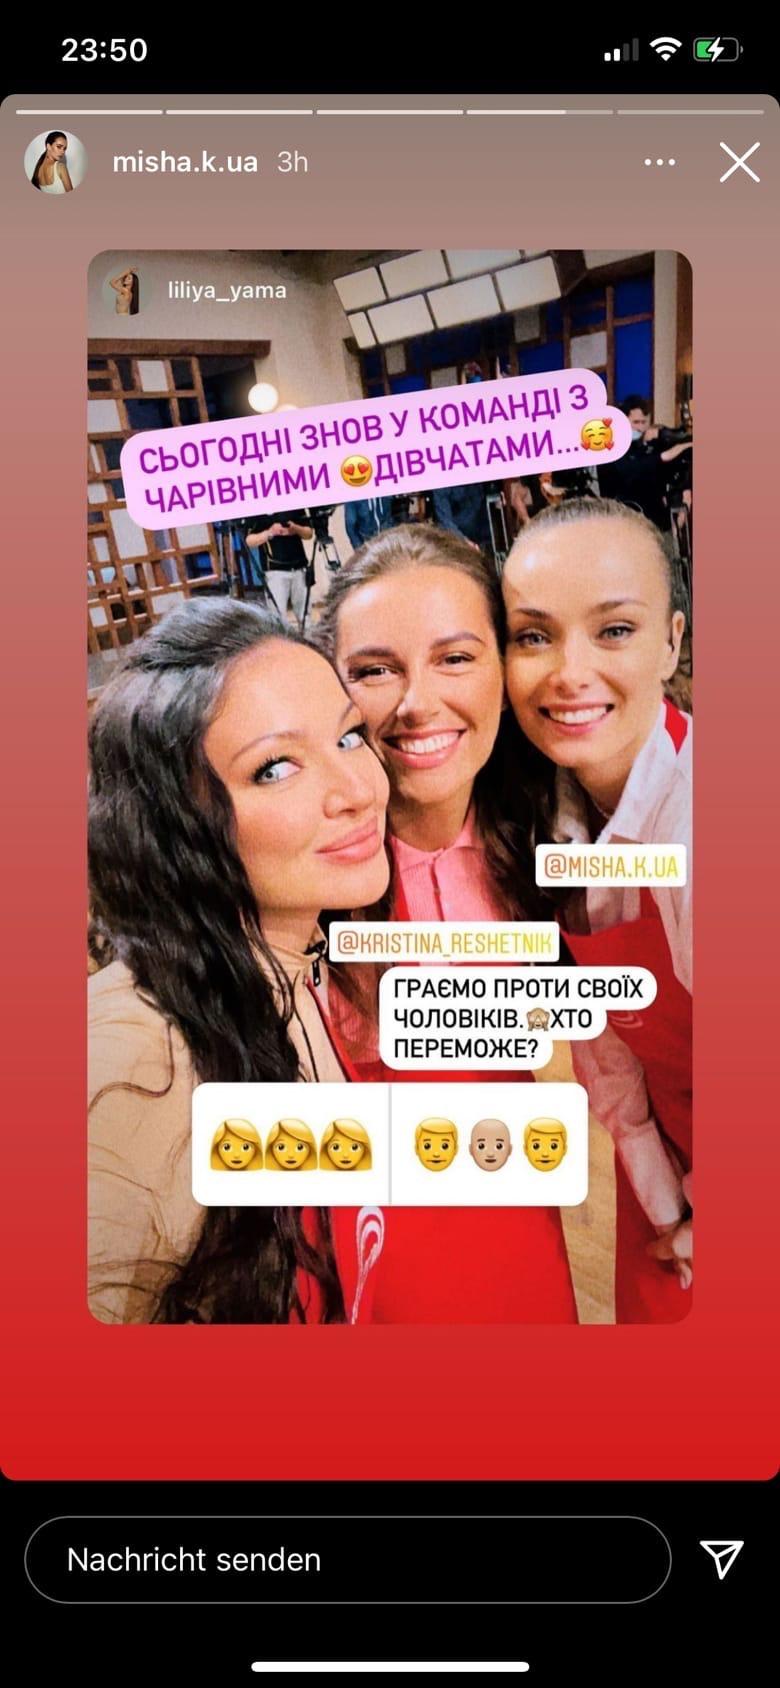 Ksenia Mishina - Sasha Ellert - Bachelorette Ukraine -  Season 1 - Discussion  - Page 9 9HKDMe9xPT4